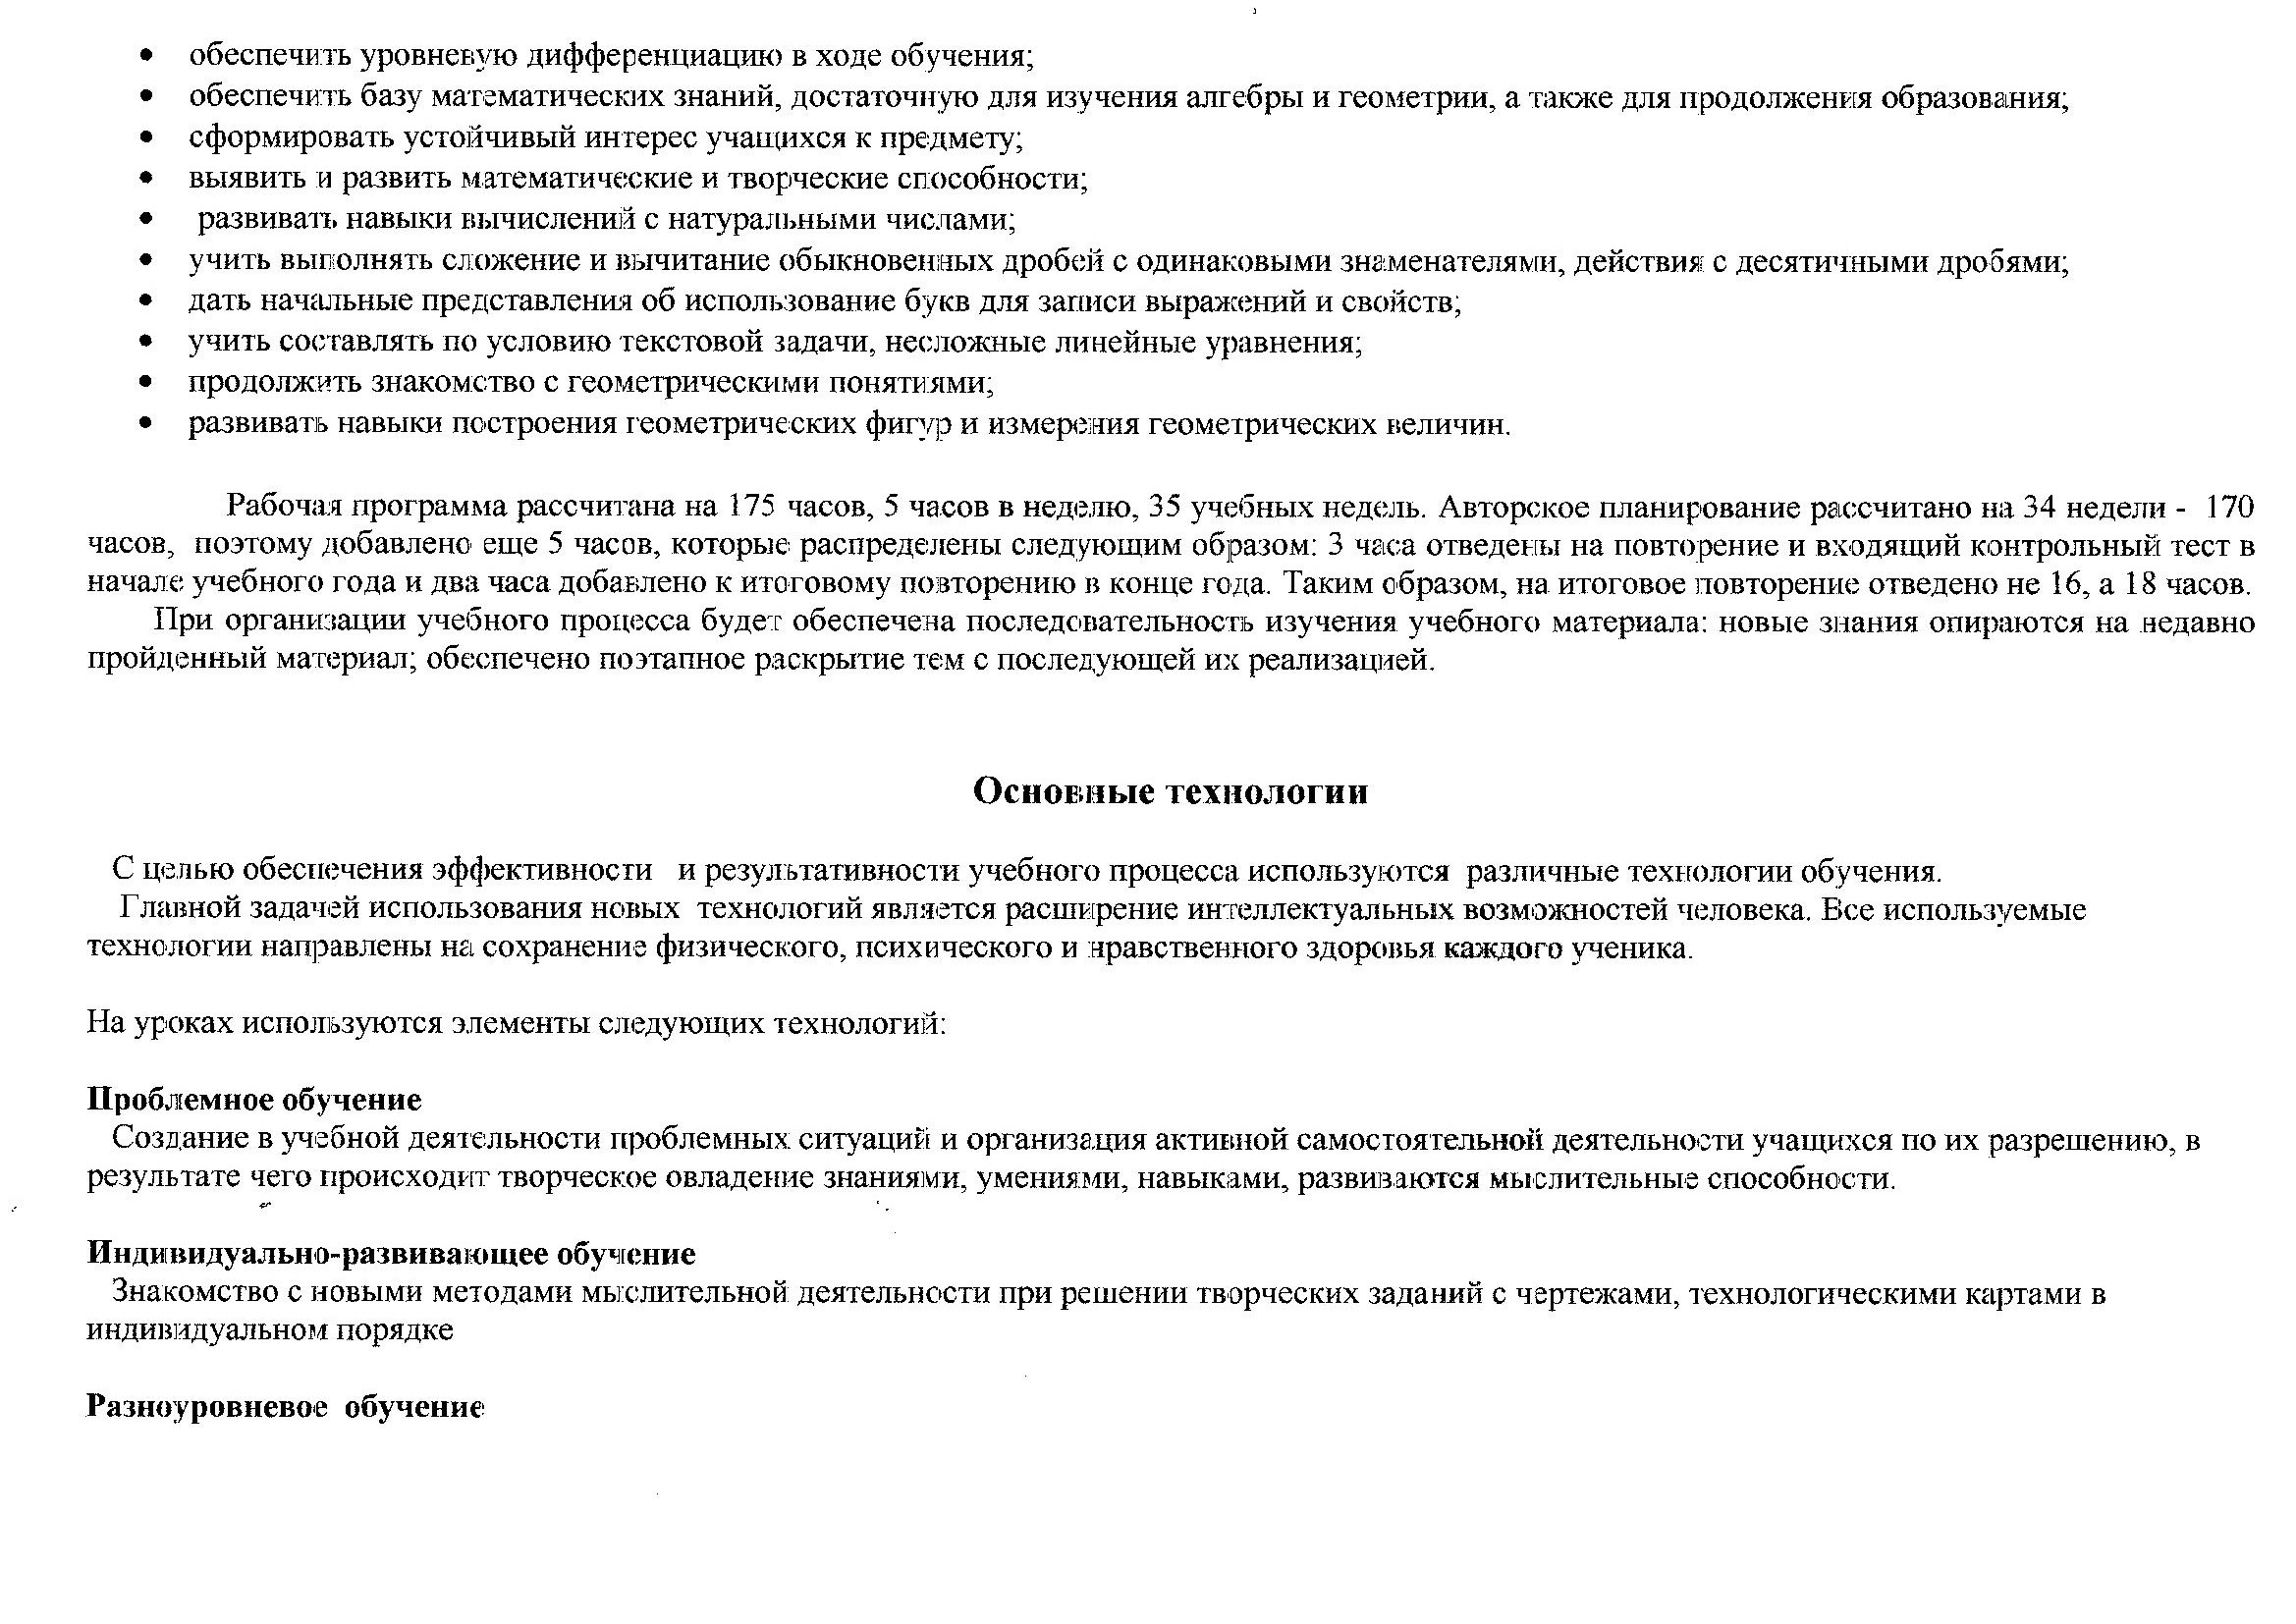 C:\Users\бакс\Documents\Scan0002.jpg